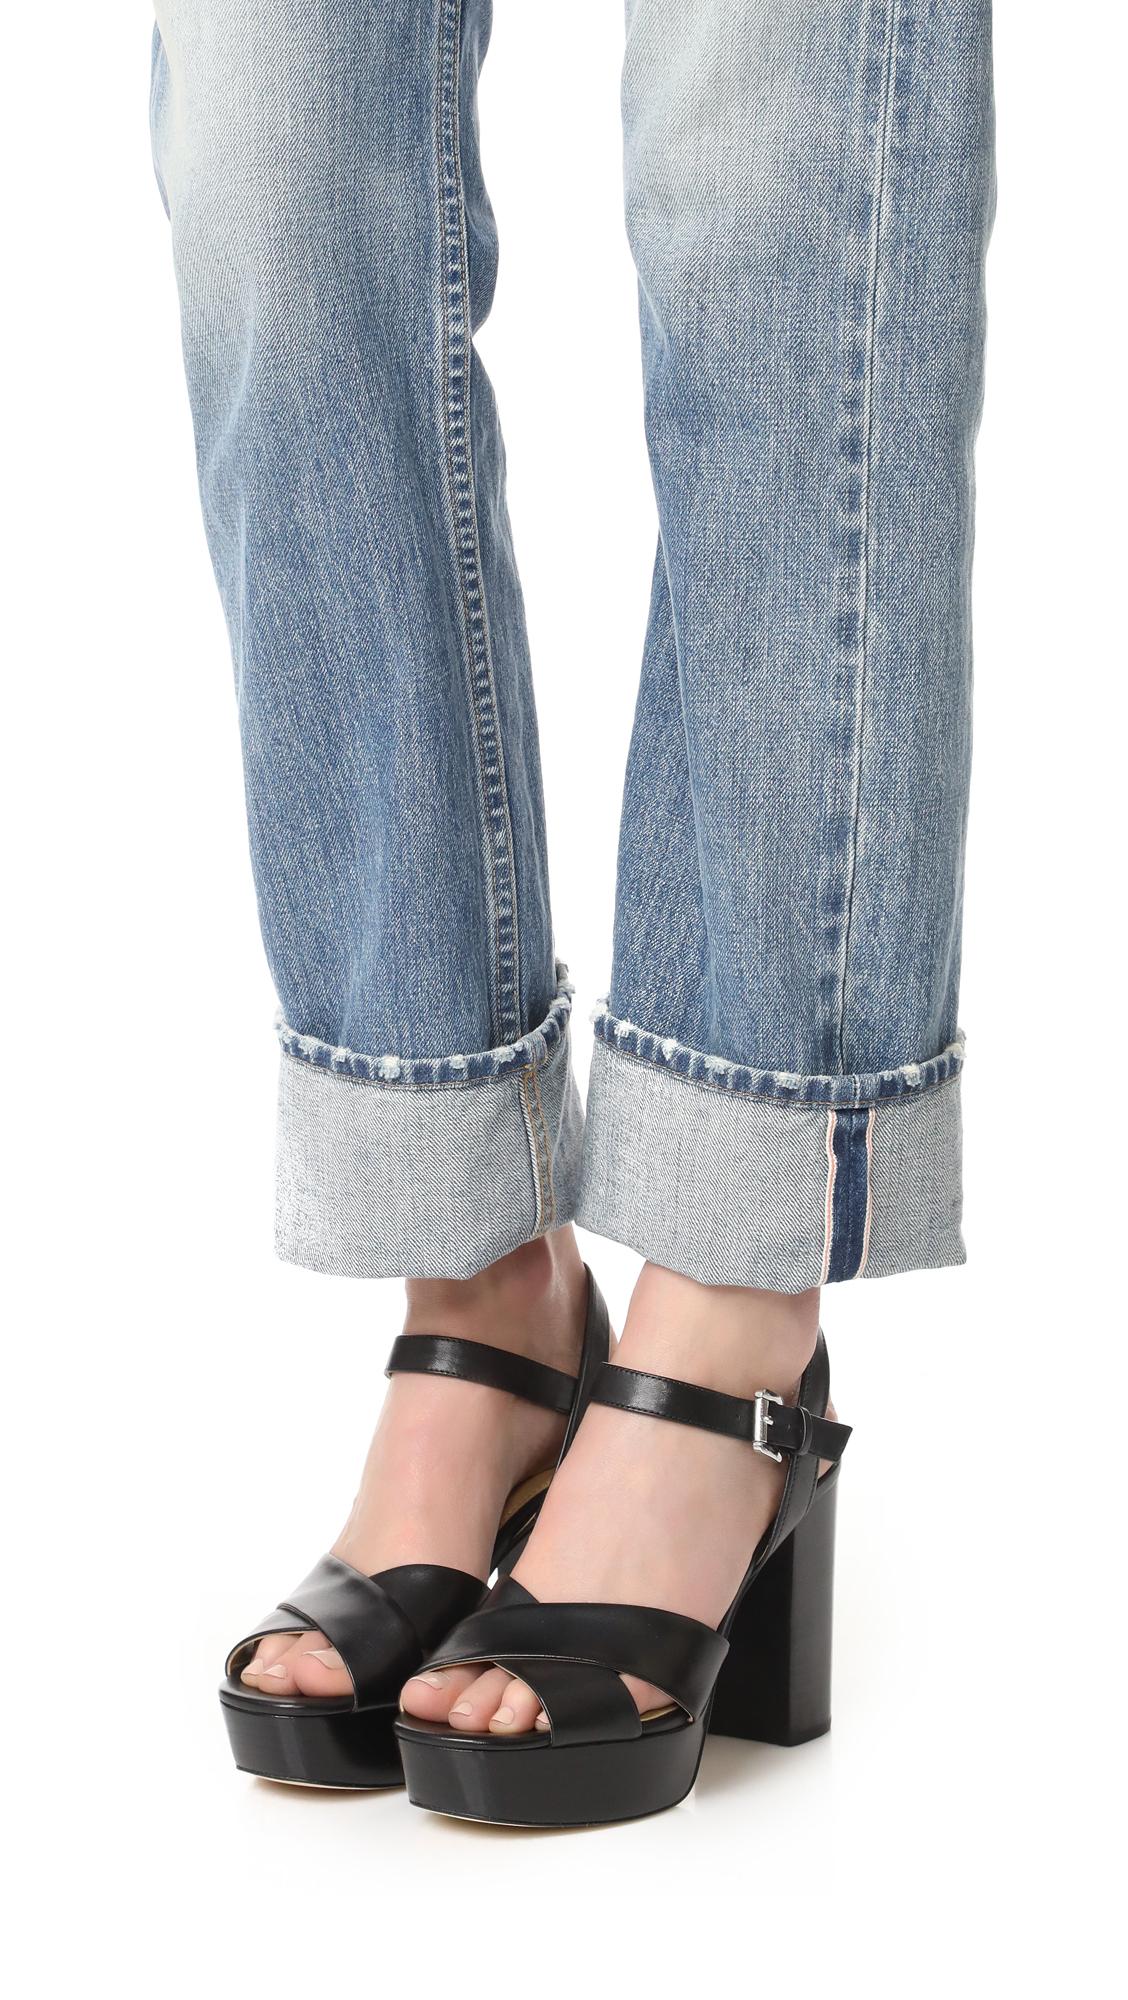 acd73249d12 MICHAEL Michael Kors Divia Platform Sandals